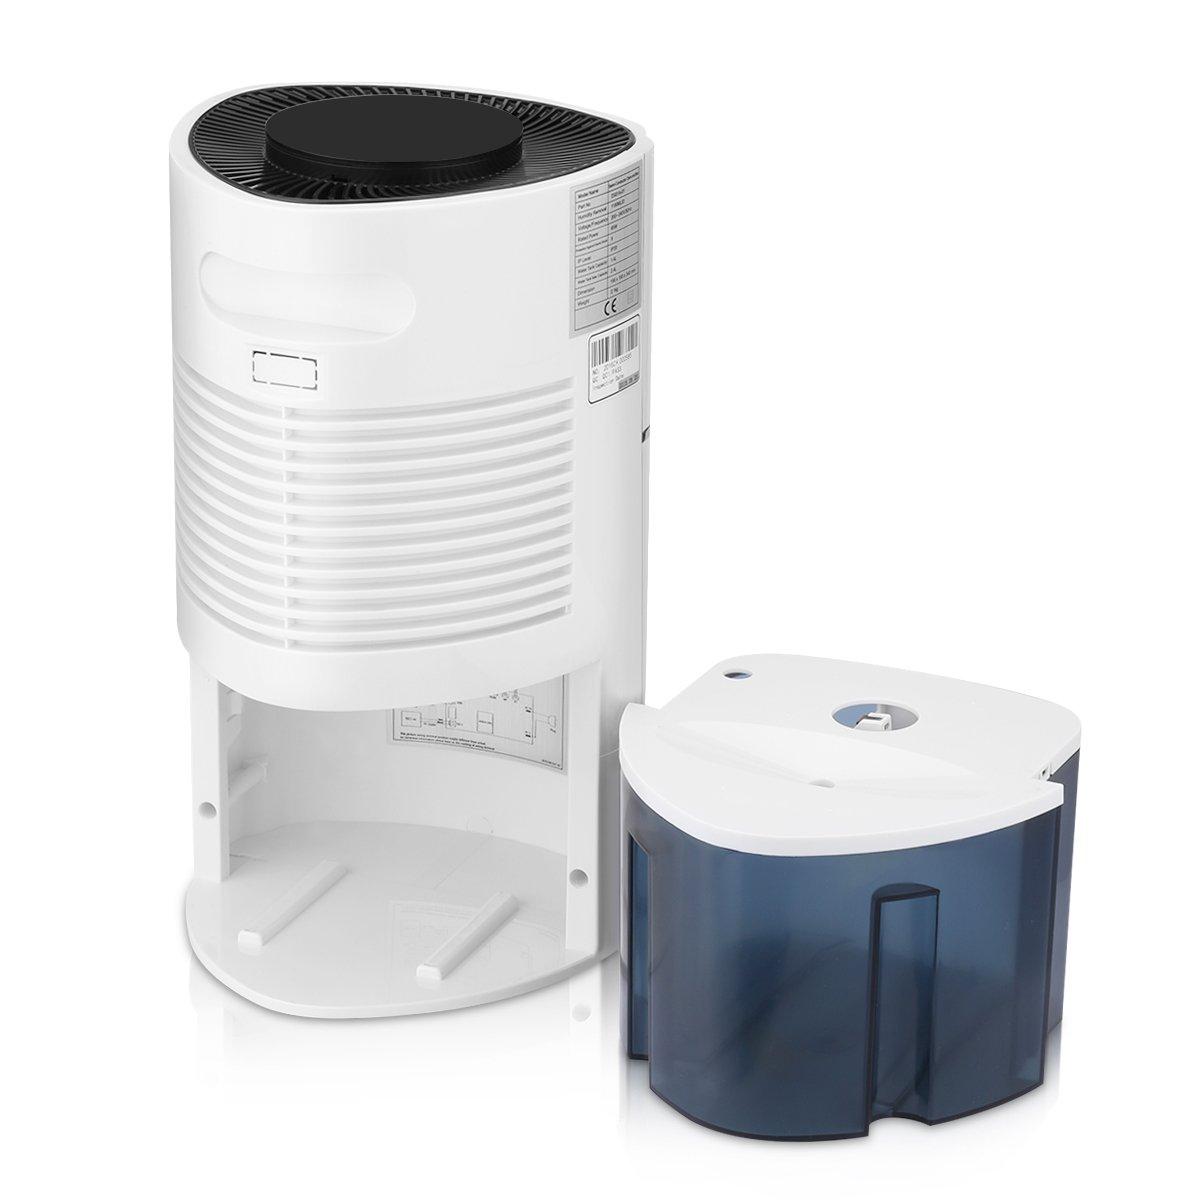 Bathroom dehumidifier uk - Finether 1 1l D Digital Air Dehumidifier Anion Uv Air Purify Portable Lightweight Low Energy Home Wardrobe Bathroom Kitchen Damp Moisture Amazon Co Uk